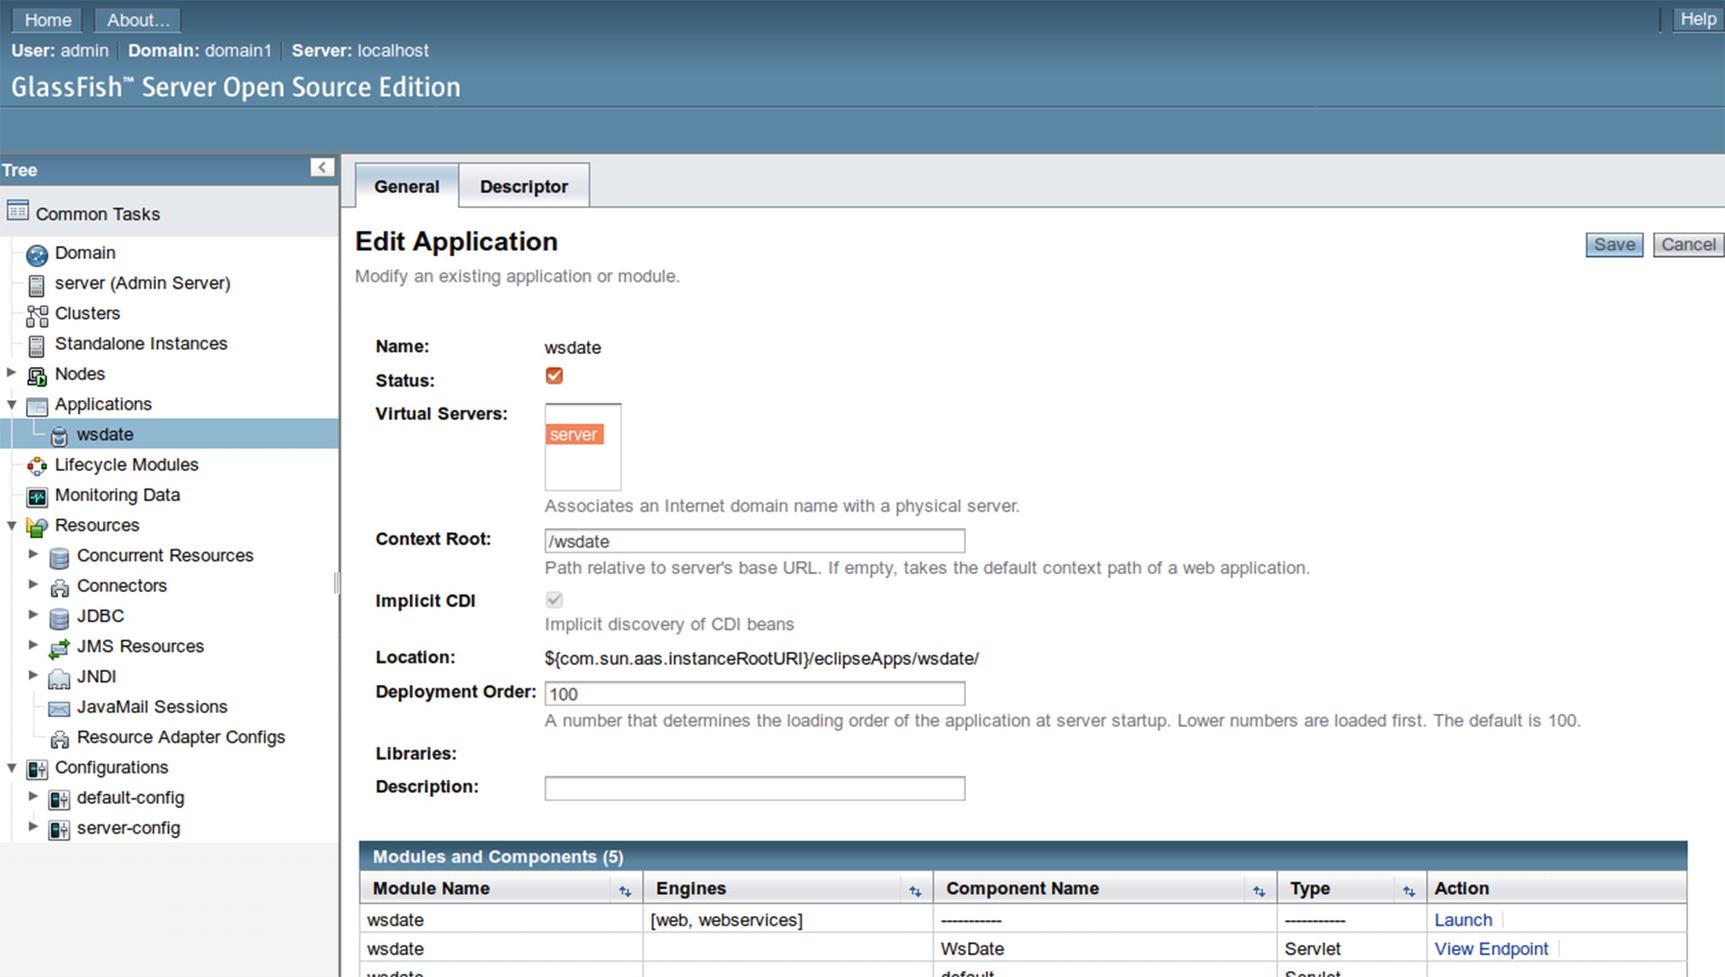 Dealing with XML Data | SpringerLink